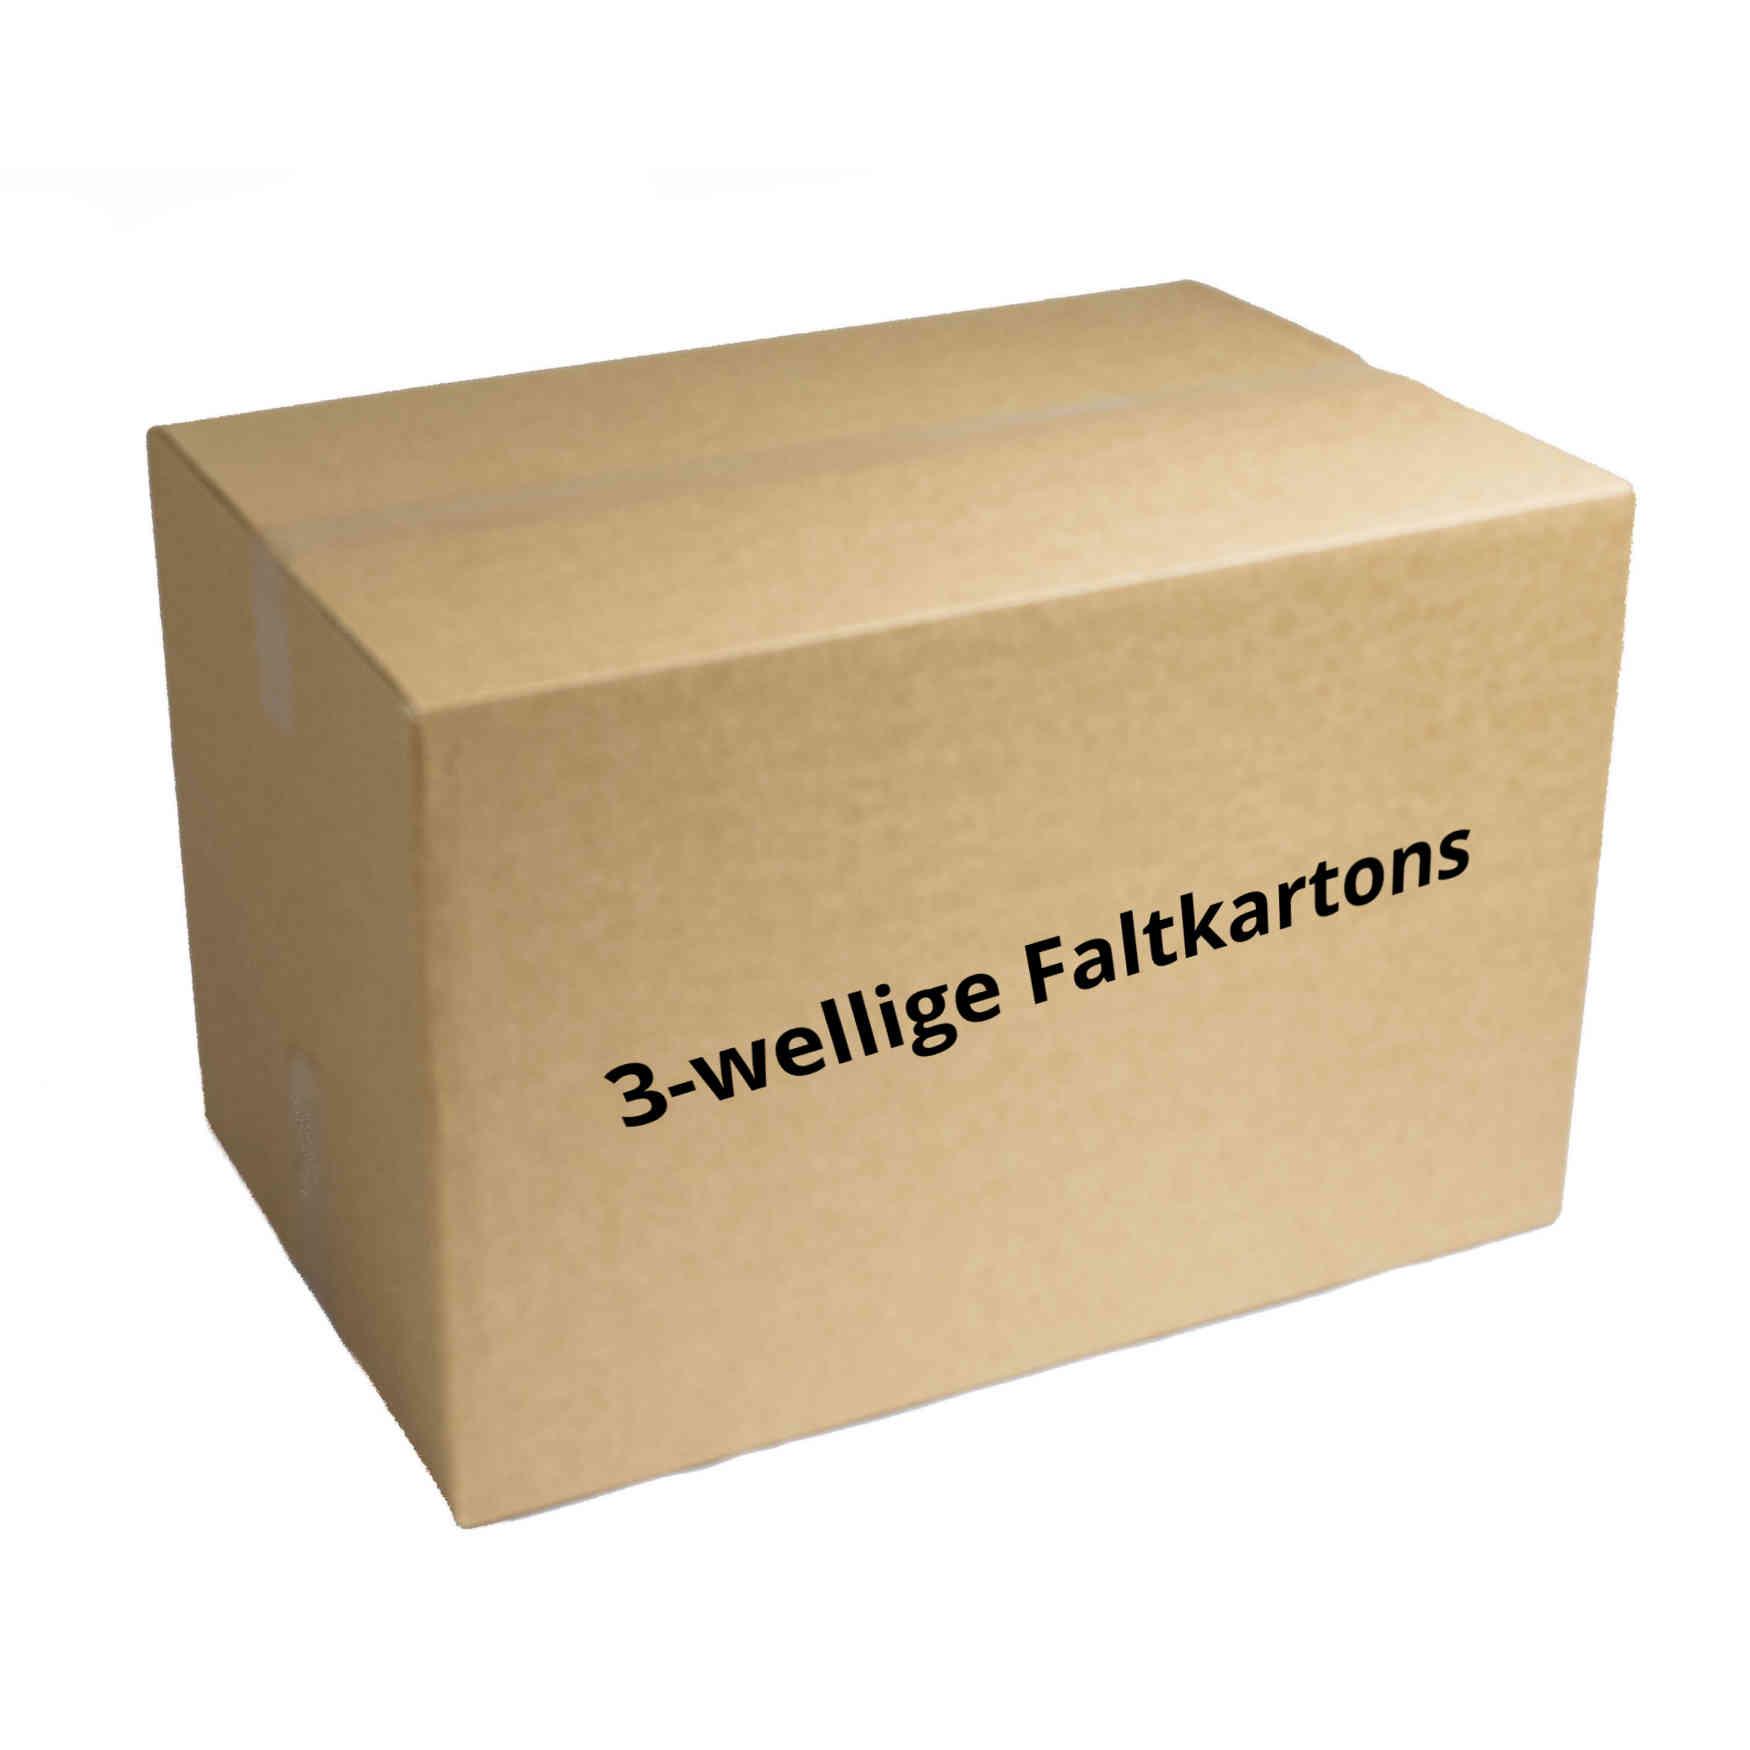 3 Wellige Faltkartons Aus Wellpappe Fefco 0201 Combra Shop De